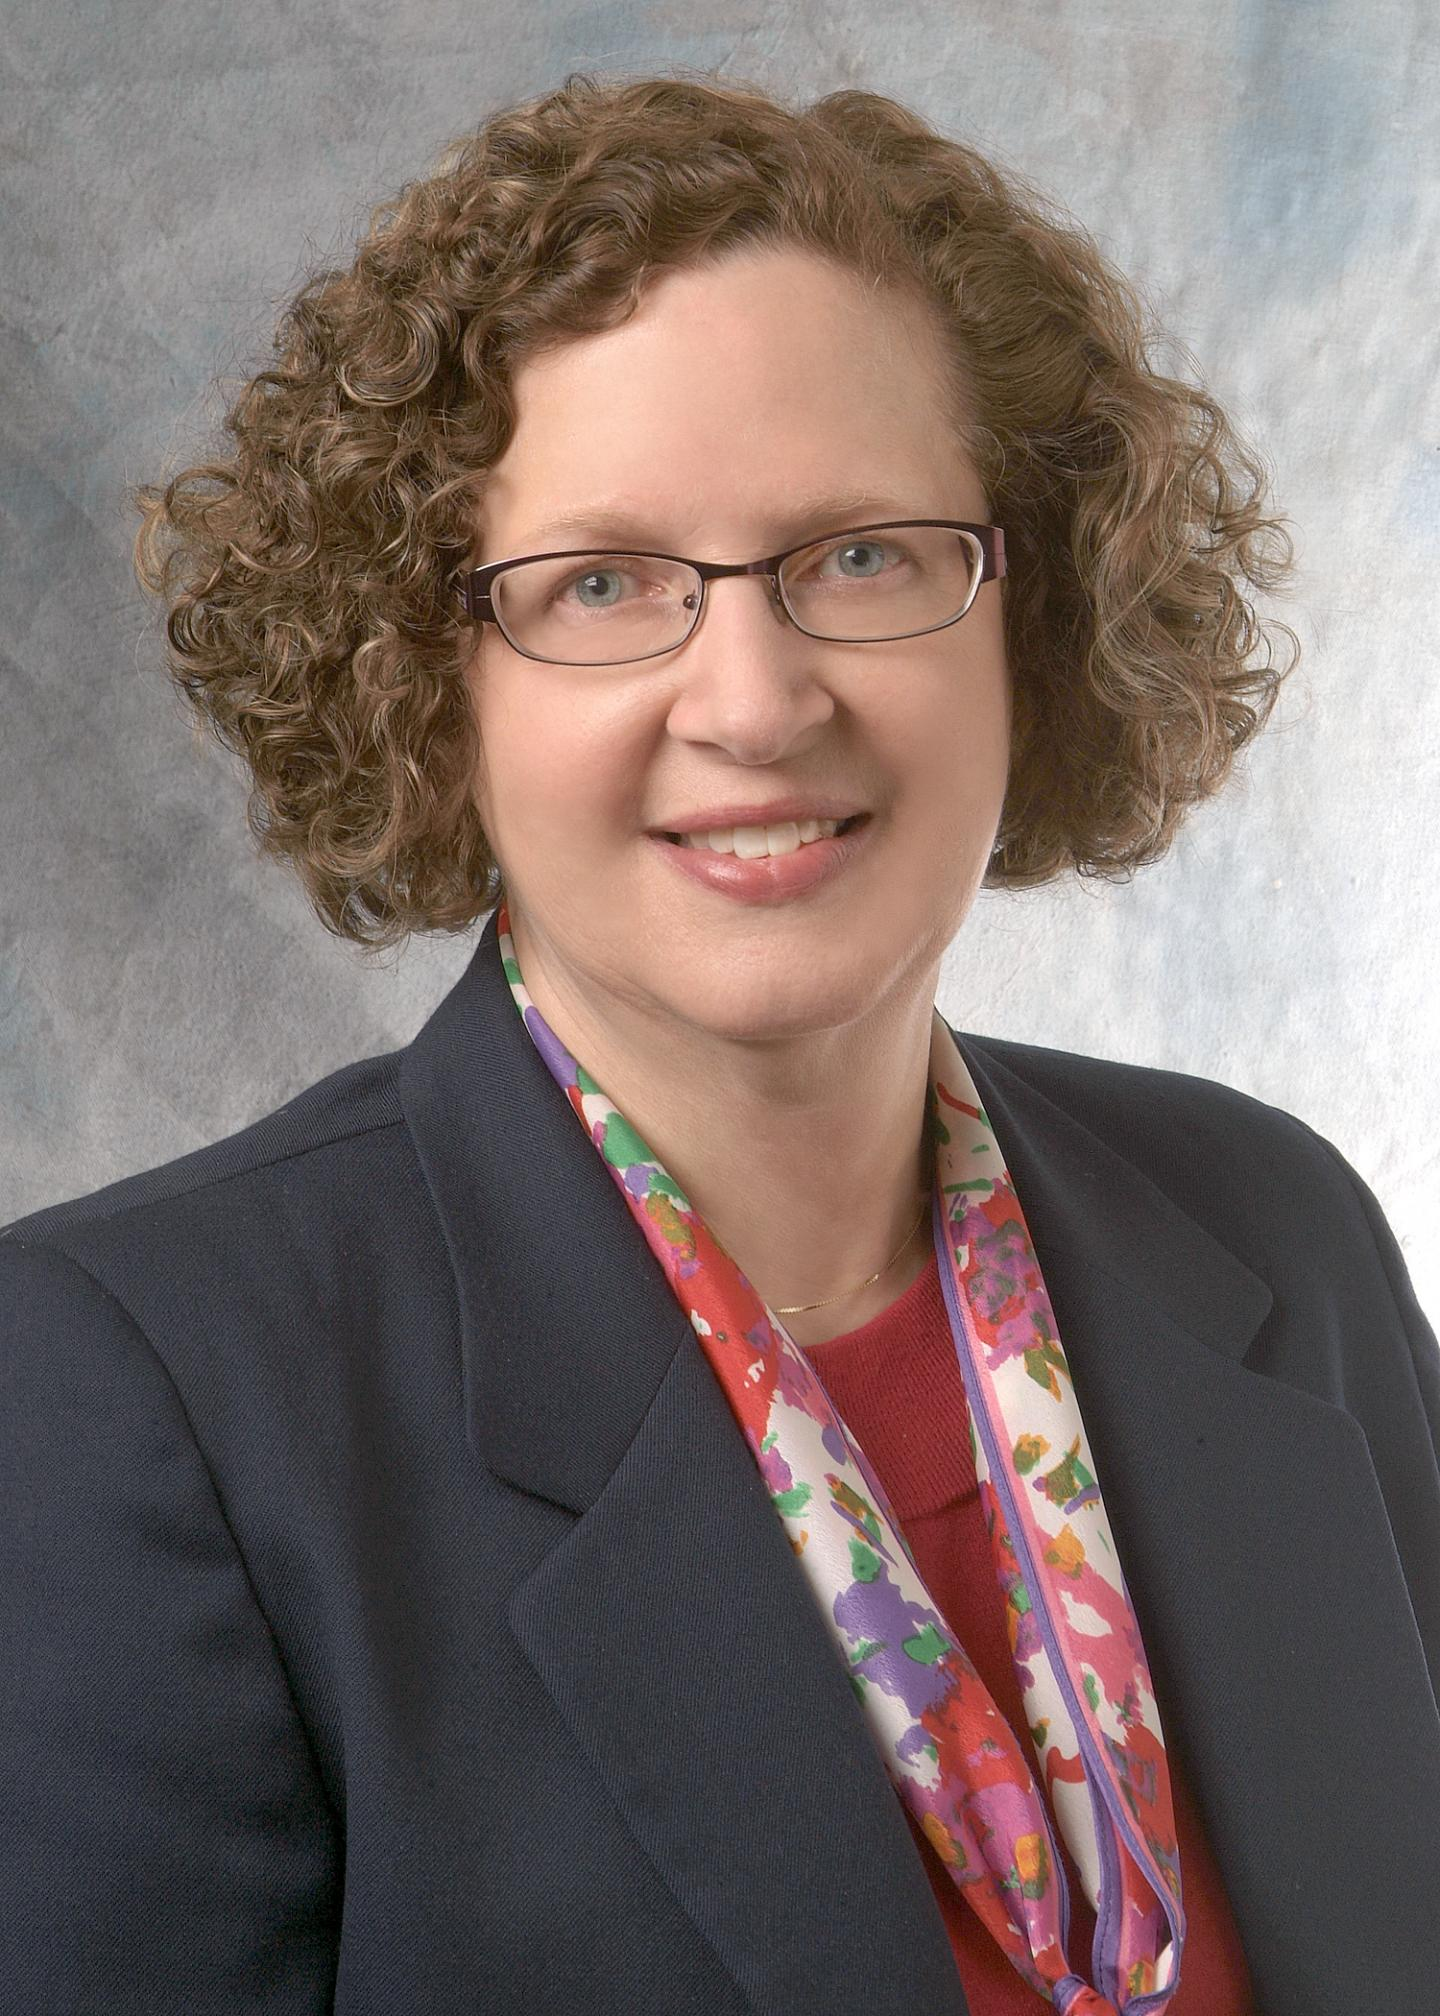 Researcher Susan Mazanec, Case Western Reserve University